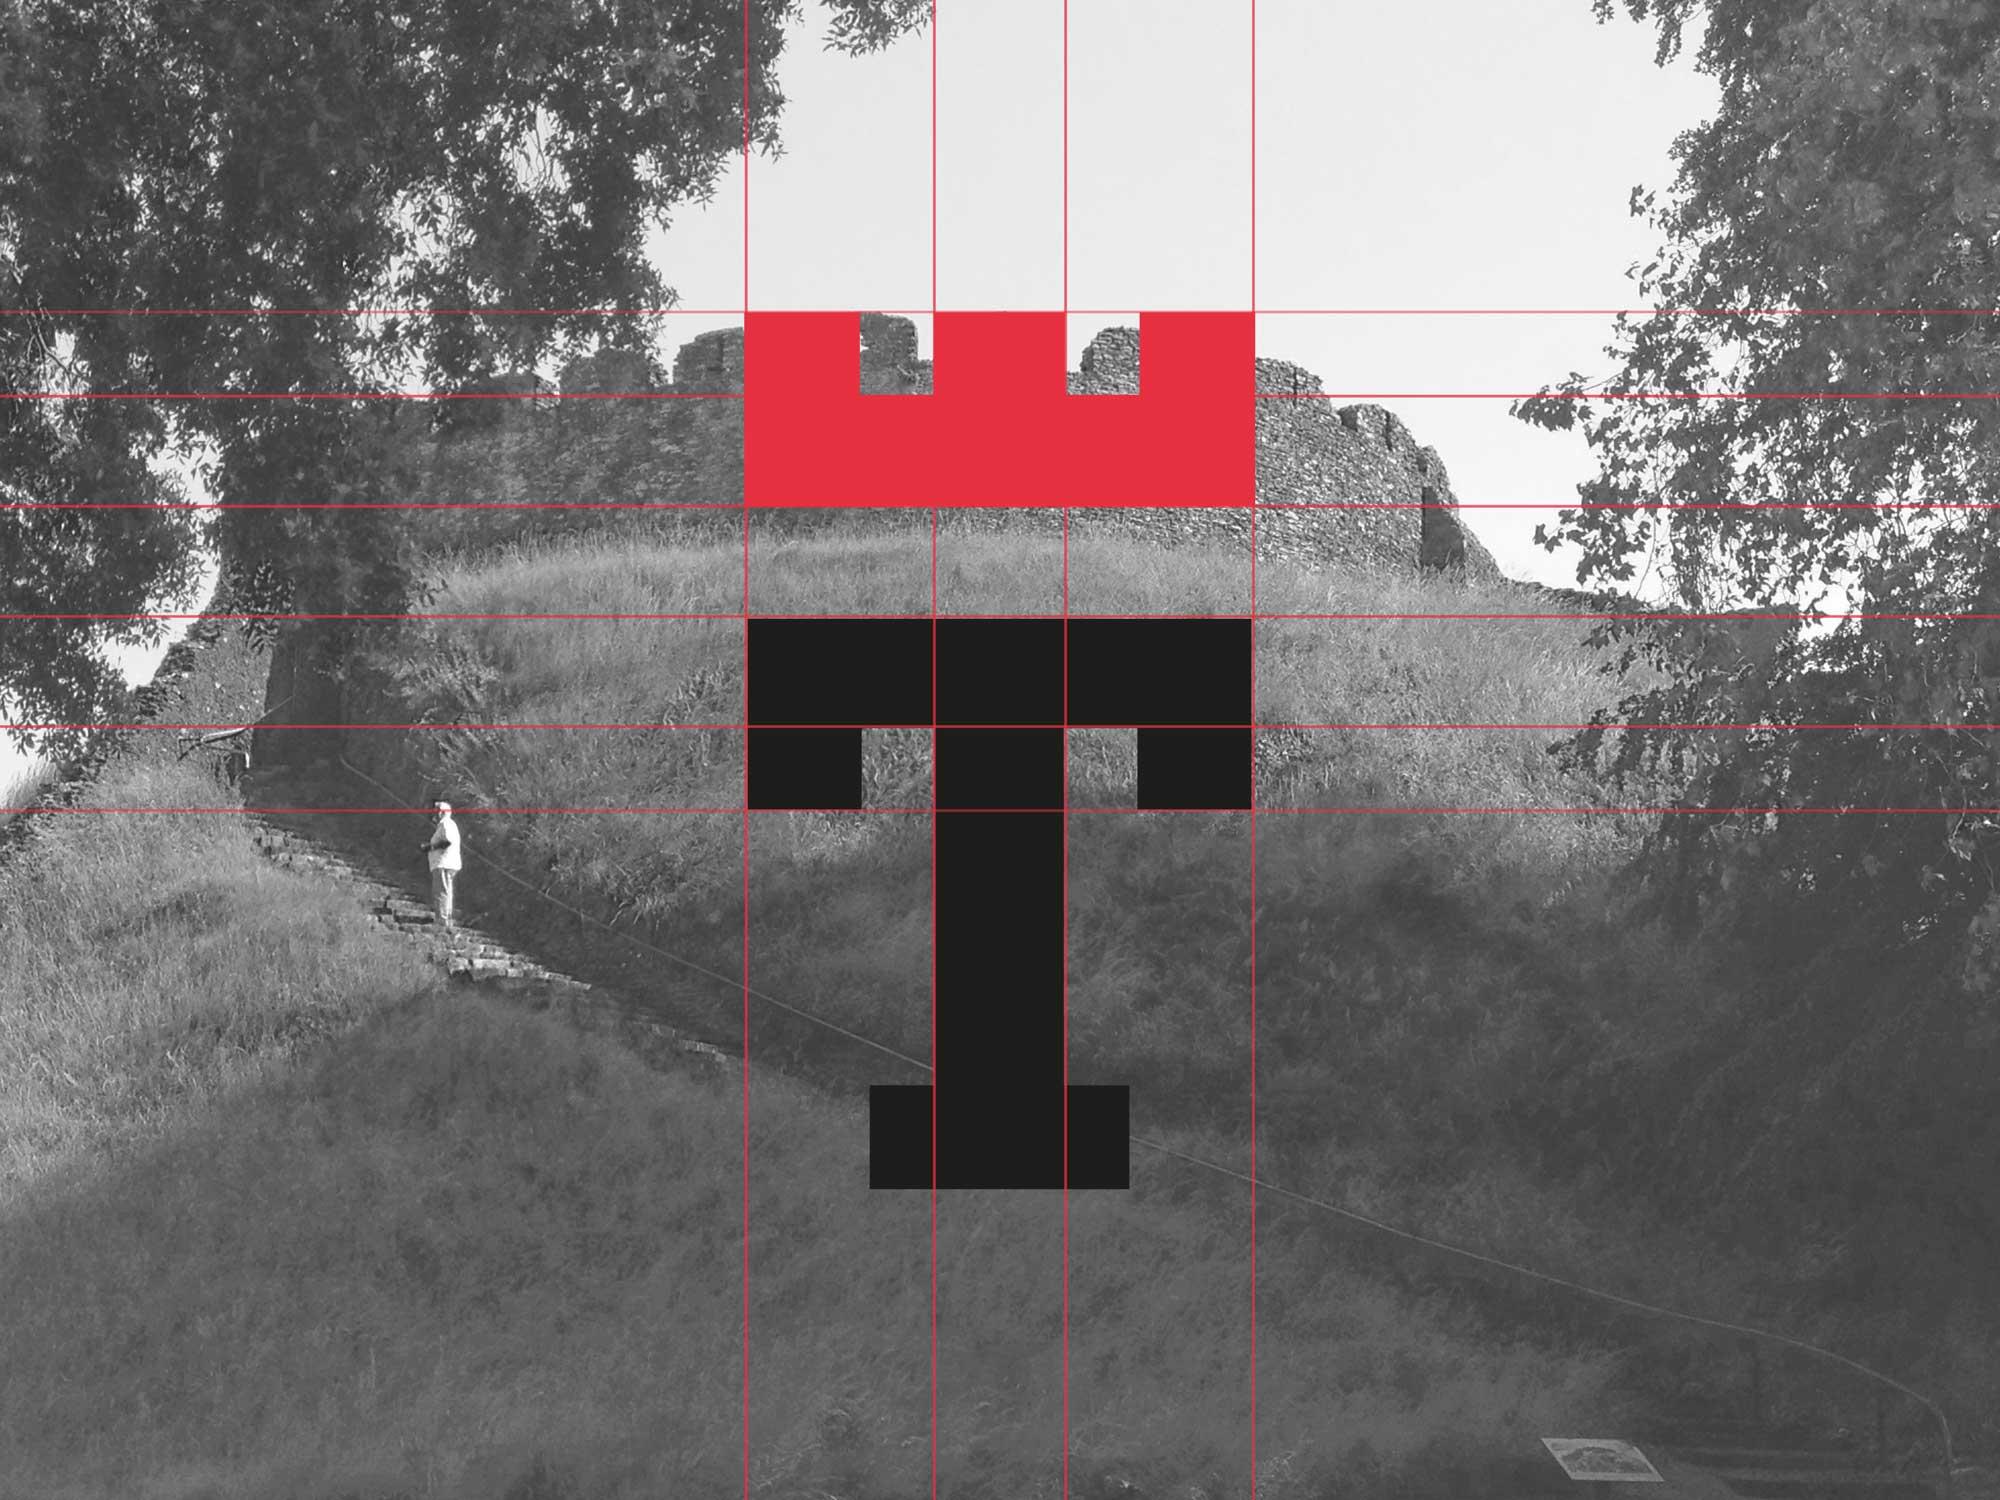 Visit-tones-for-left-bridge-logo-d.jpg